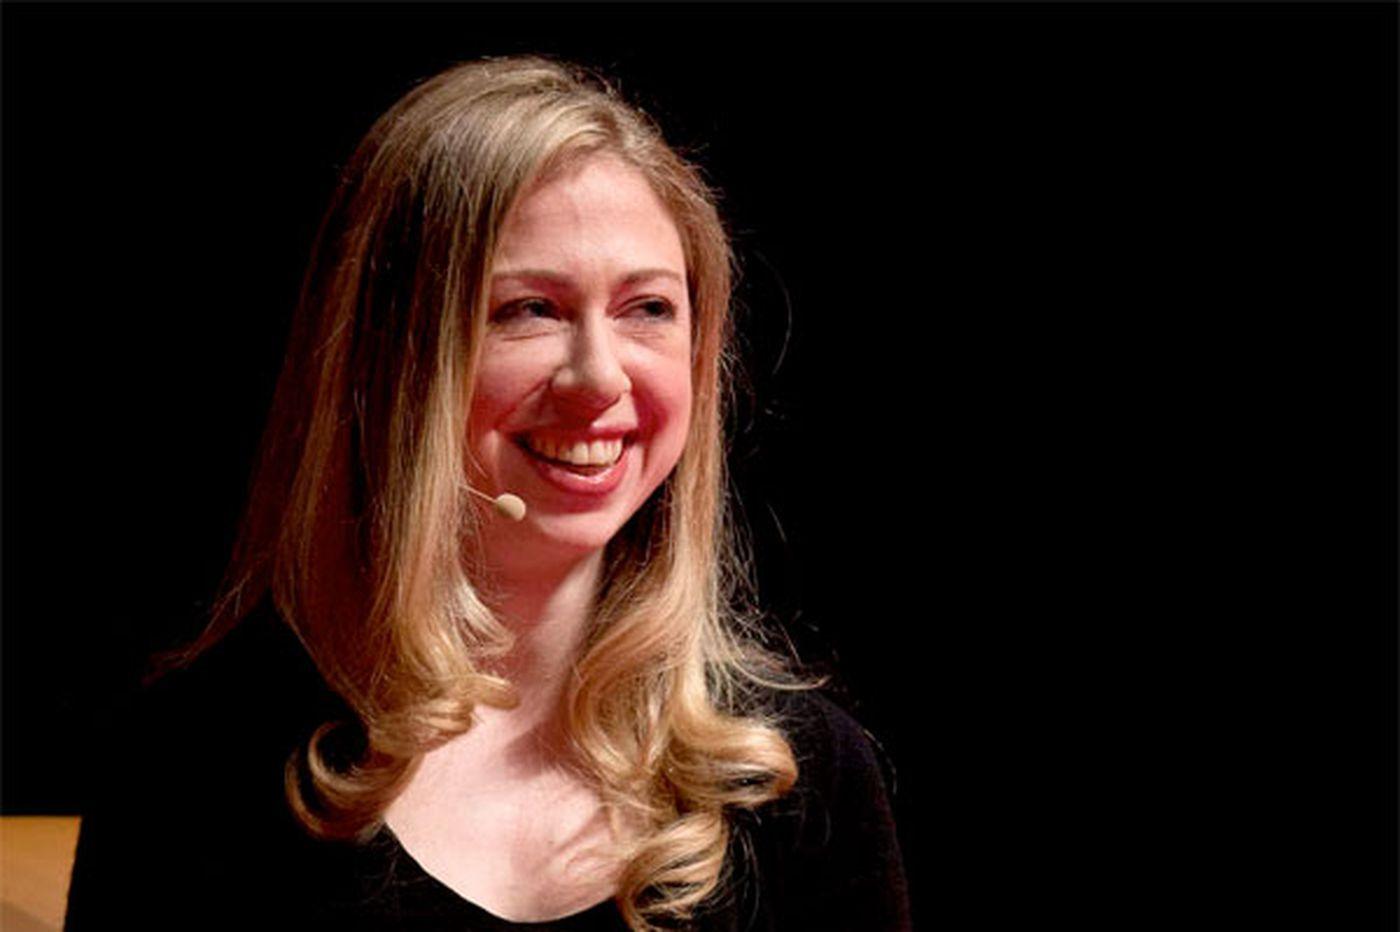 Sideshow: Chelsea Clinton speaks up